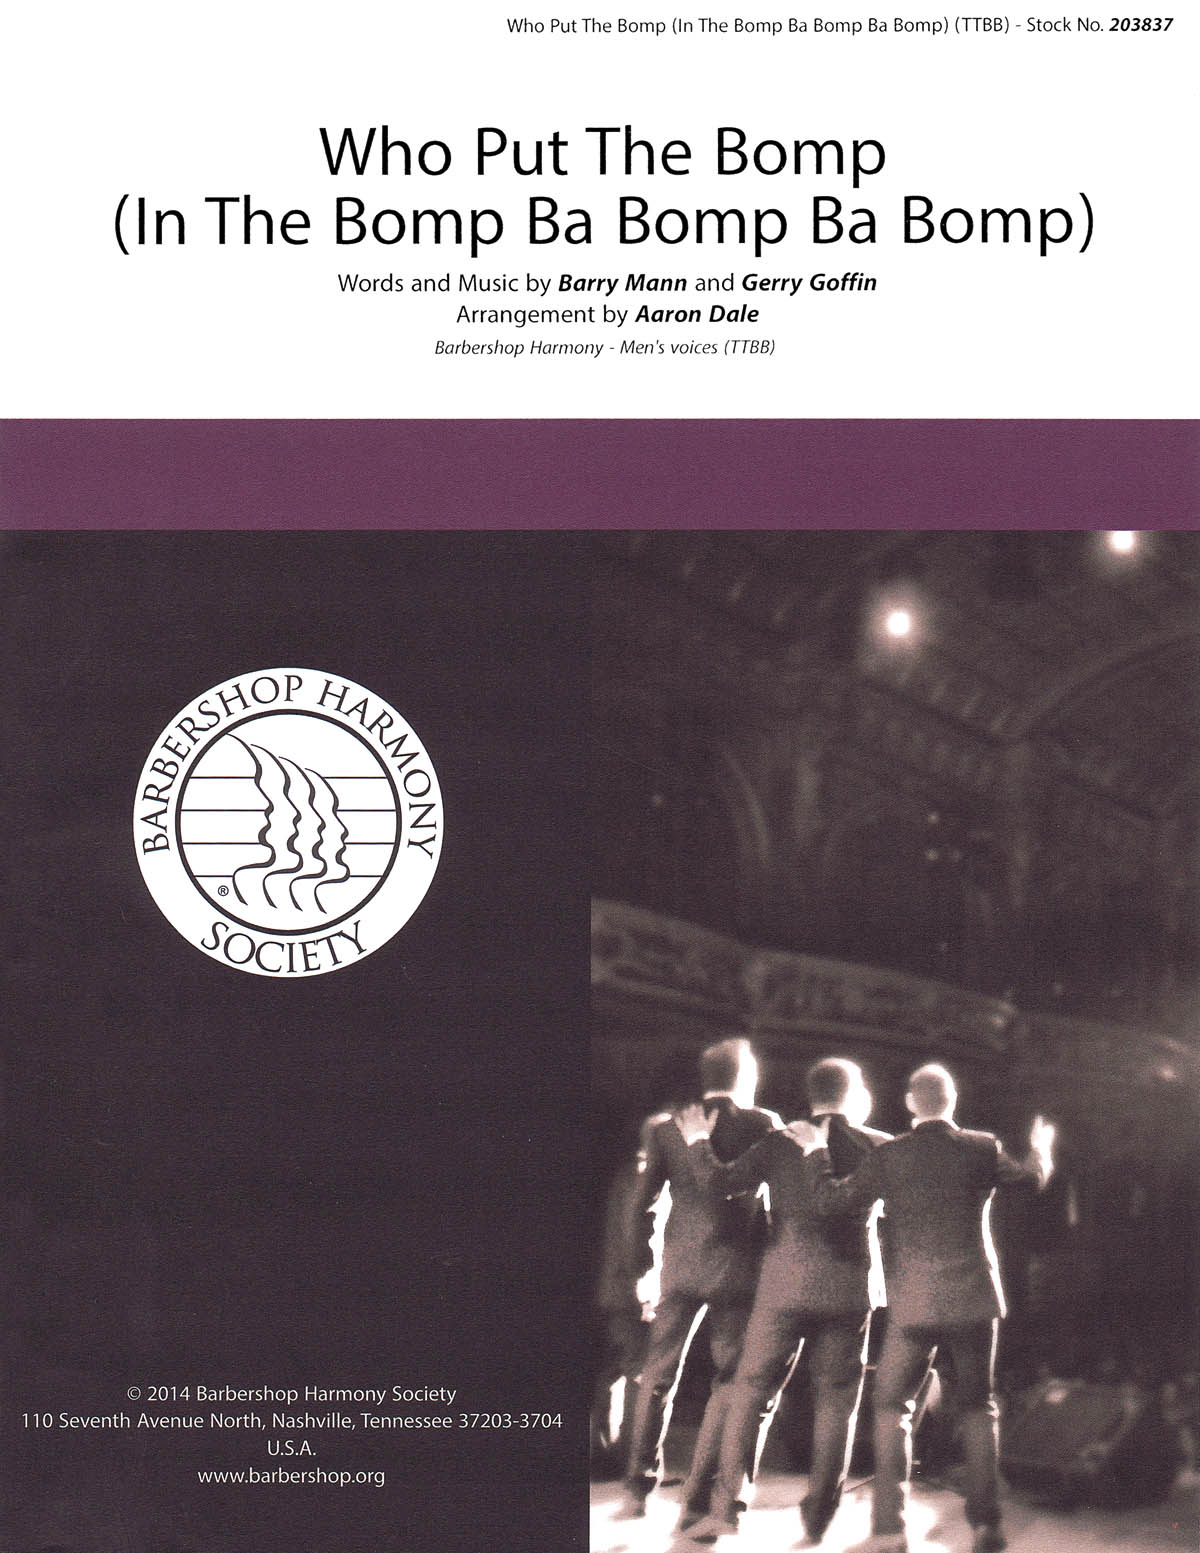 Who Put The Bomp (In The Bomp Ba Bomp Ba Bomp) : TTBB : Aaron Dale : Barry Mann : Barry Mann : Songbook : 00155688 : 812817021013